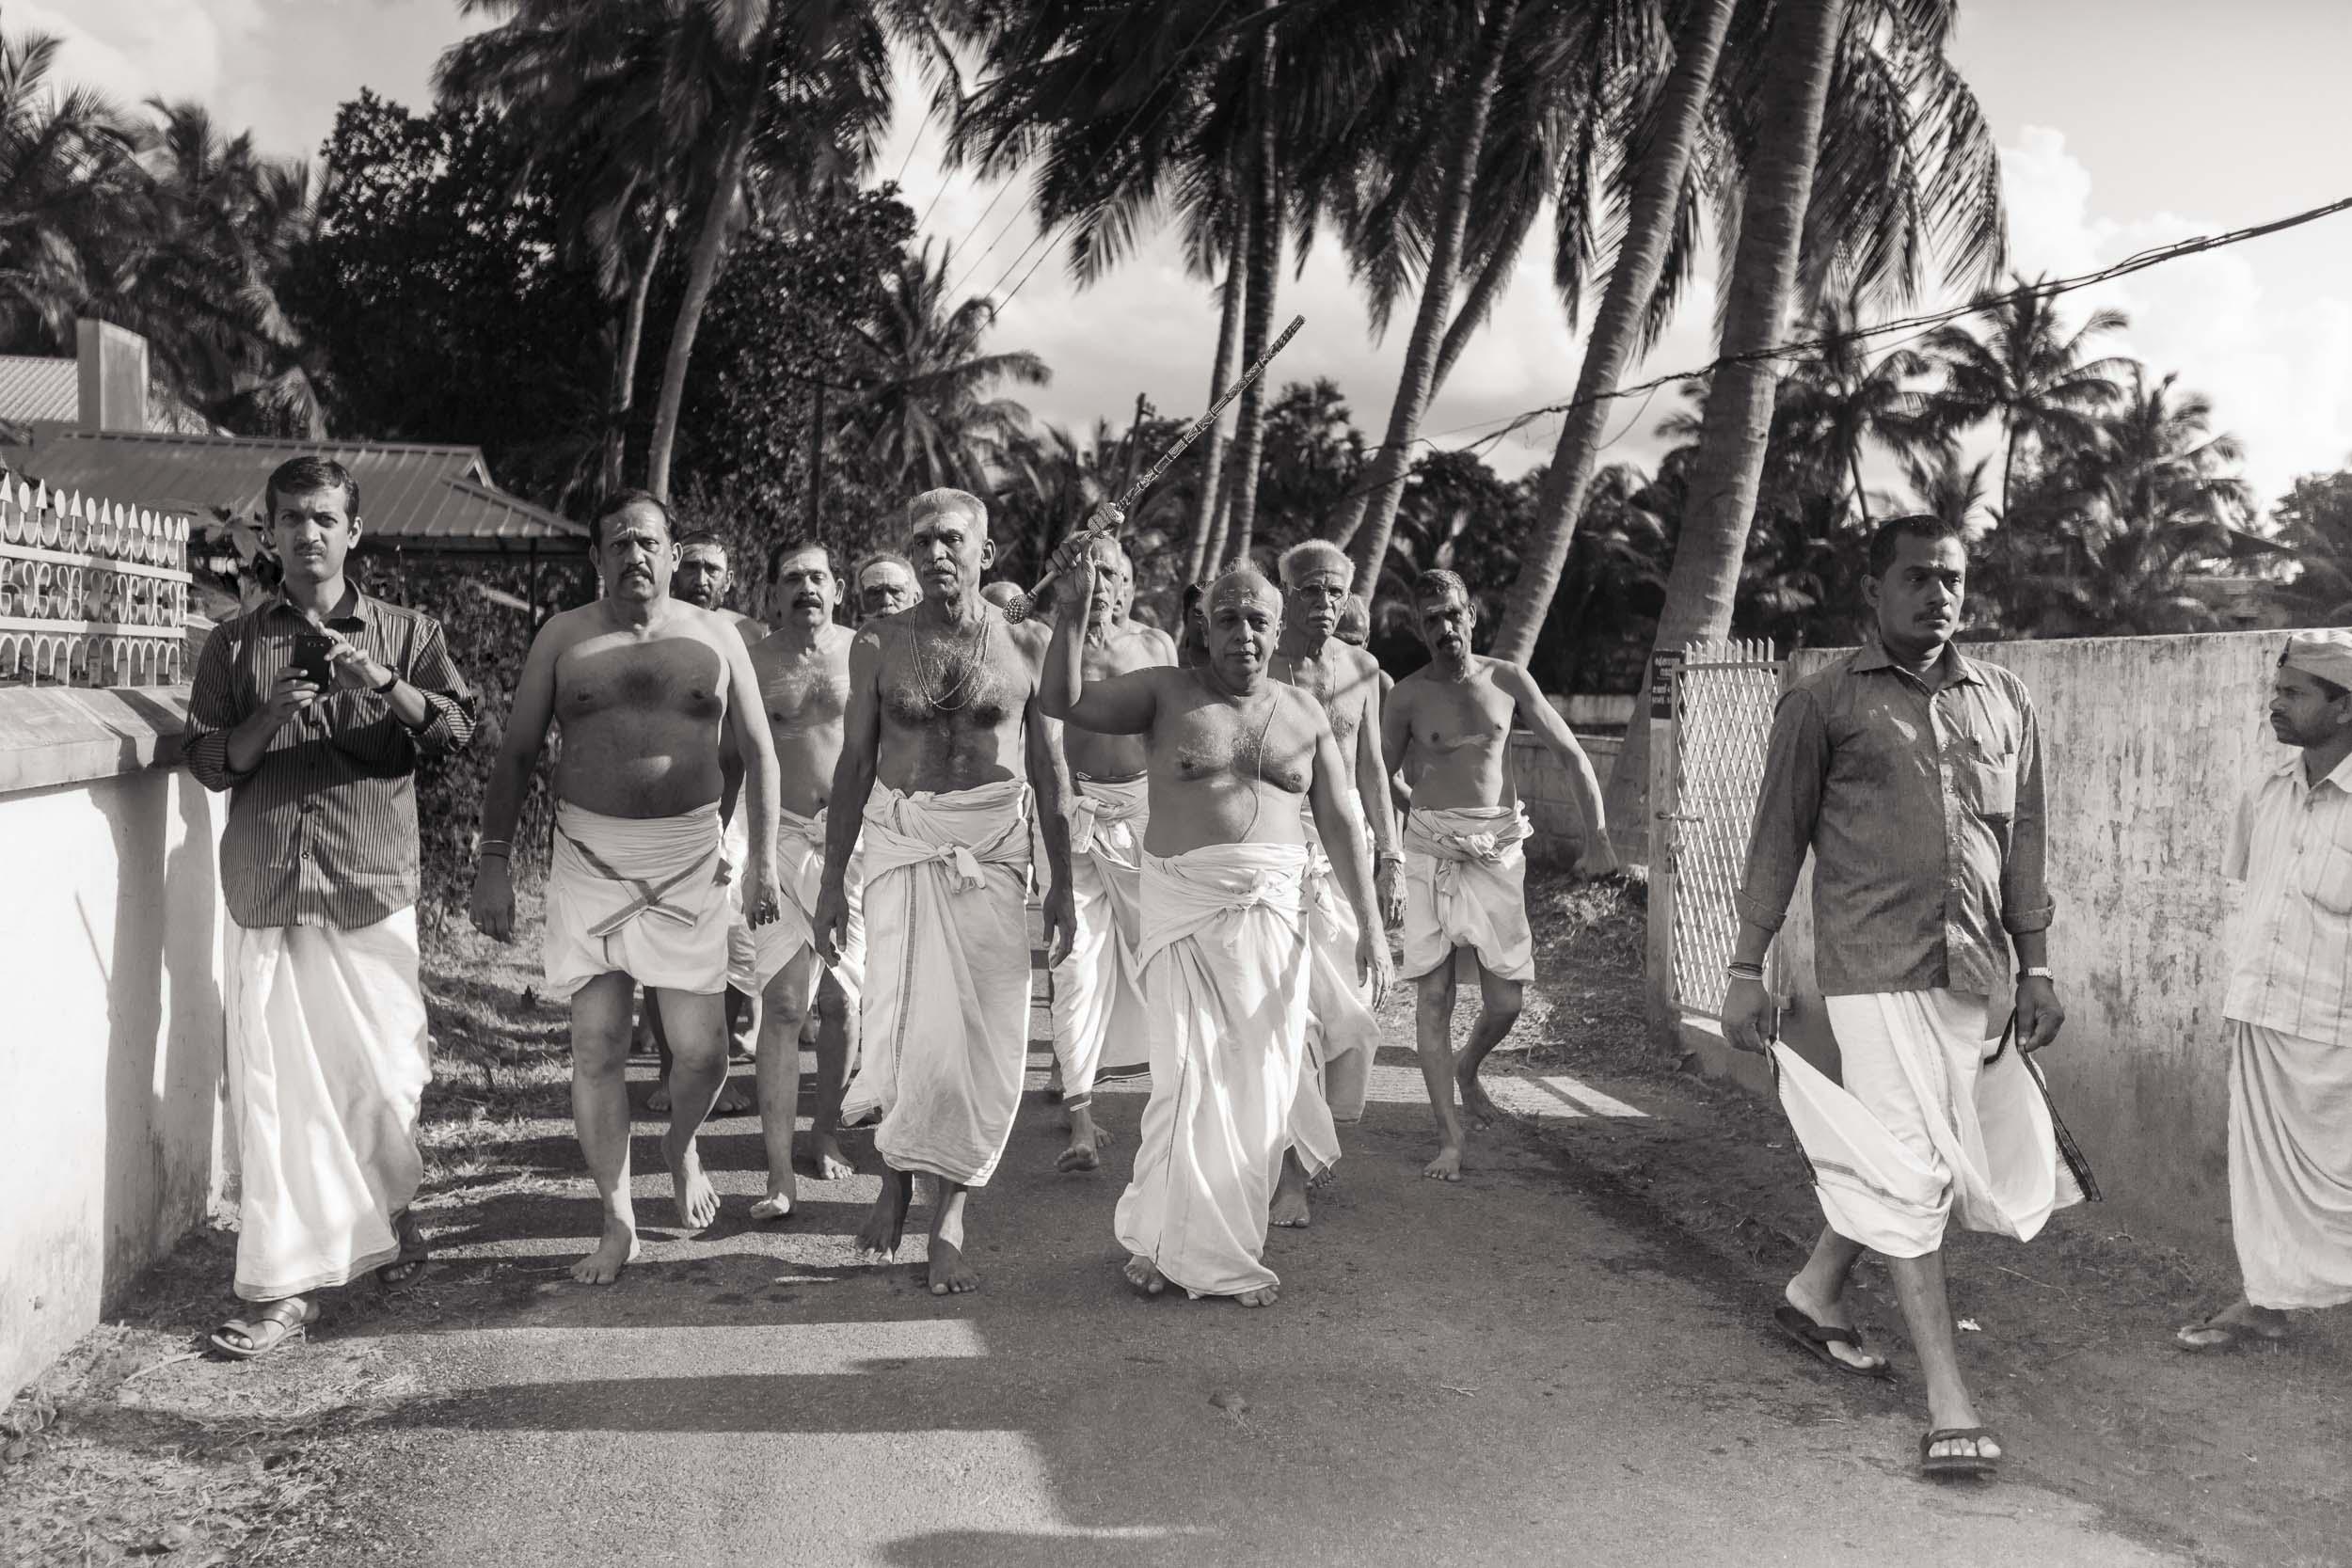 Sindhur_Photography_Travel_People_Kerala-24.JPG